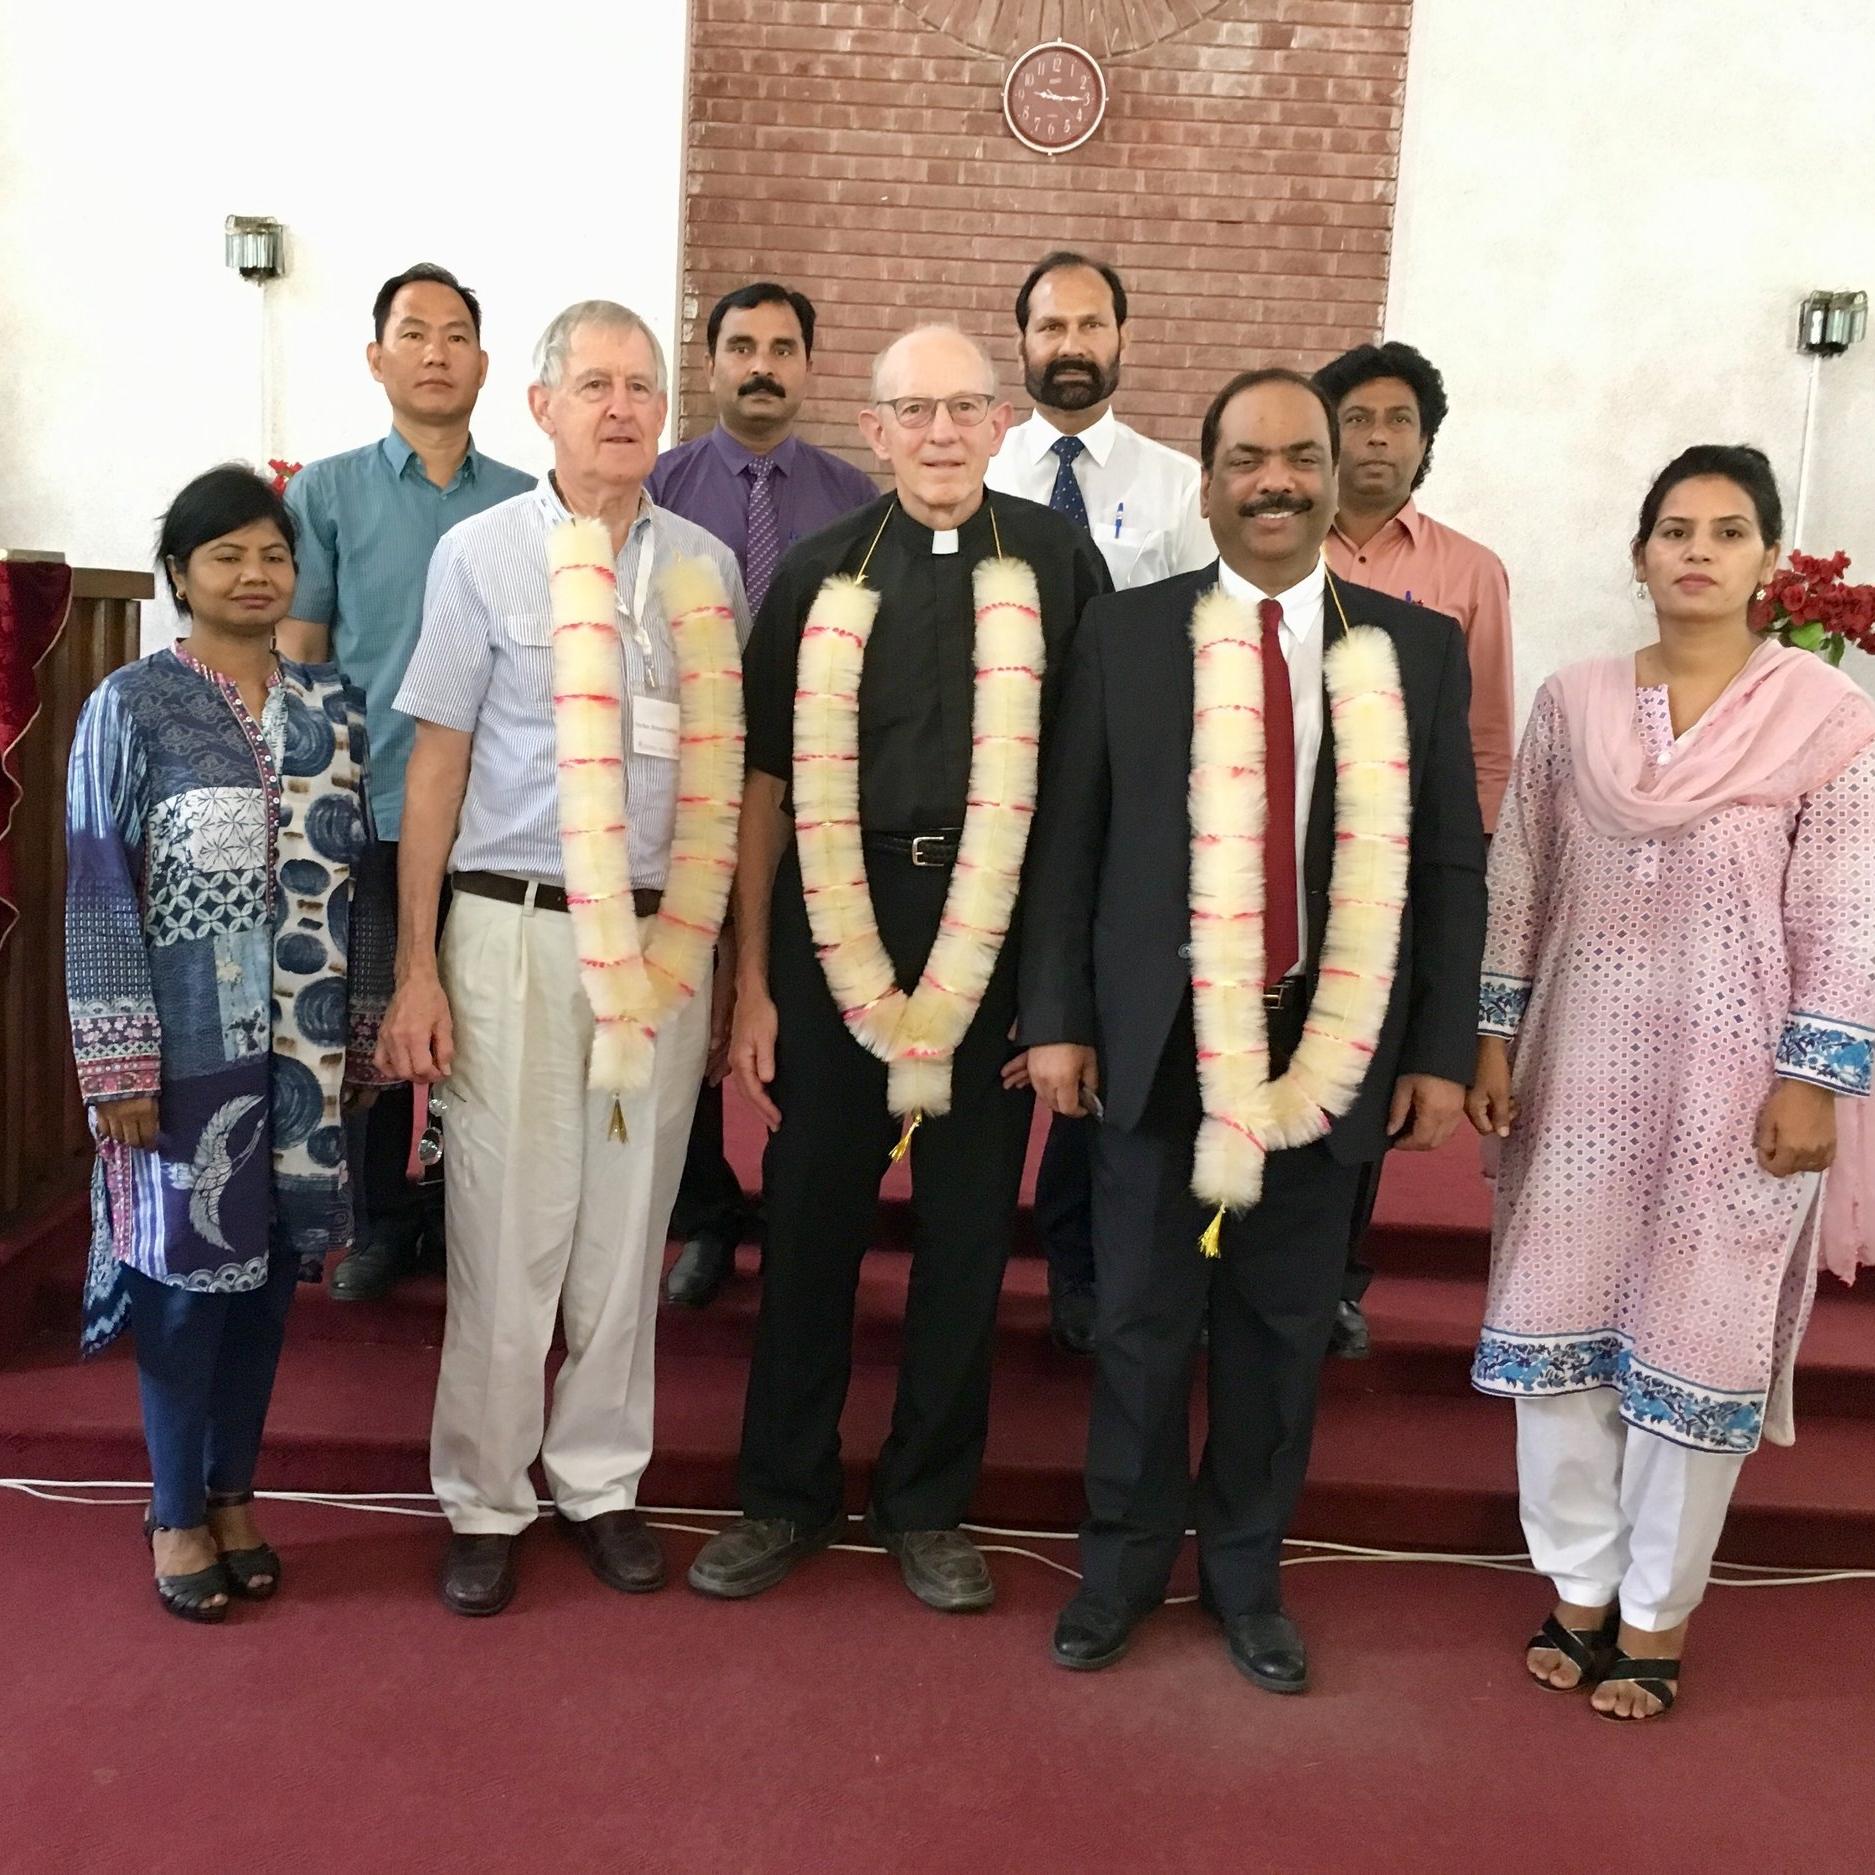 Rob and Richard with PCP Moderator Majid Abel and faculty at Gujranwala Theological Seminary